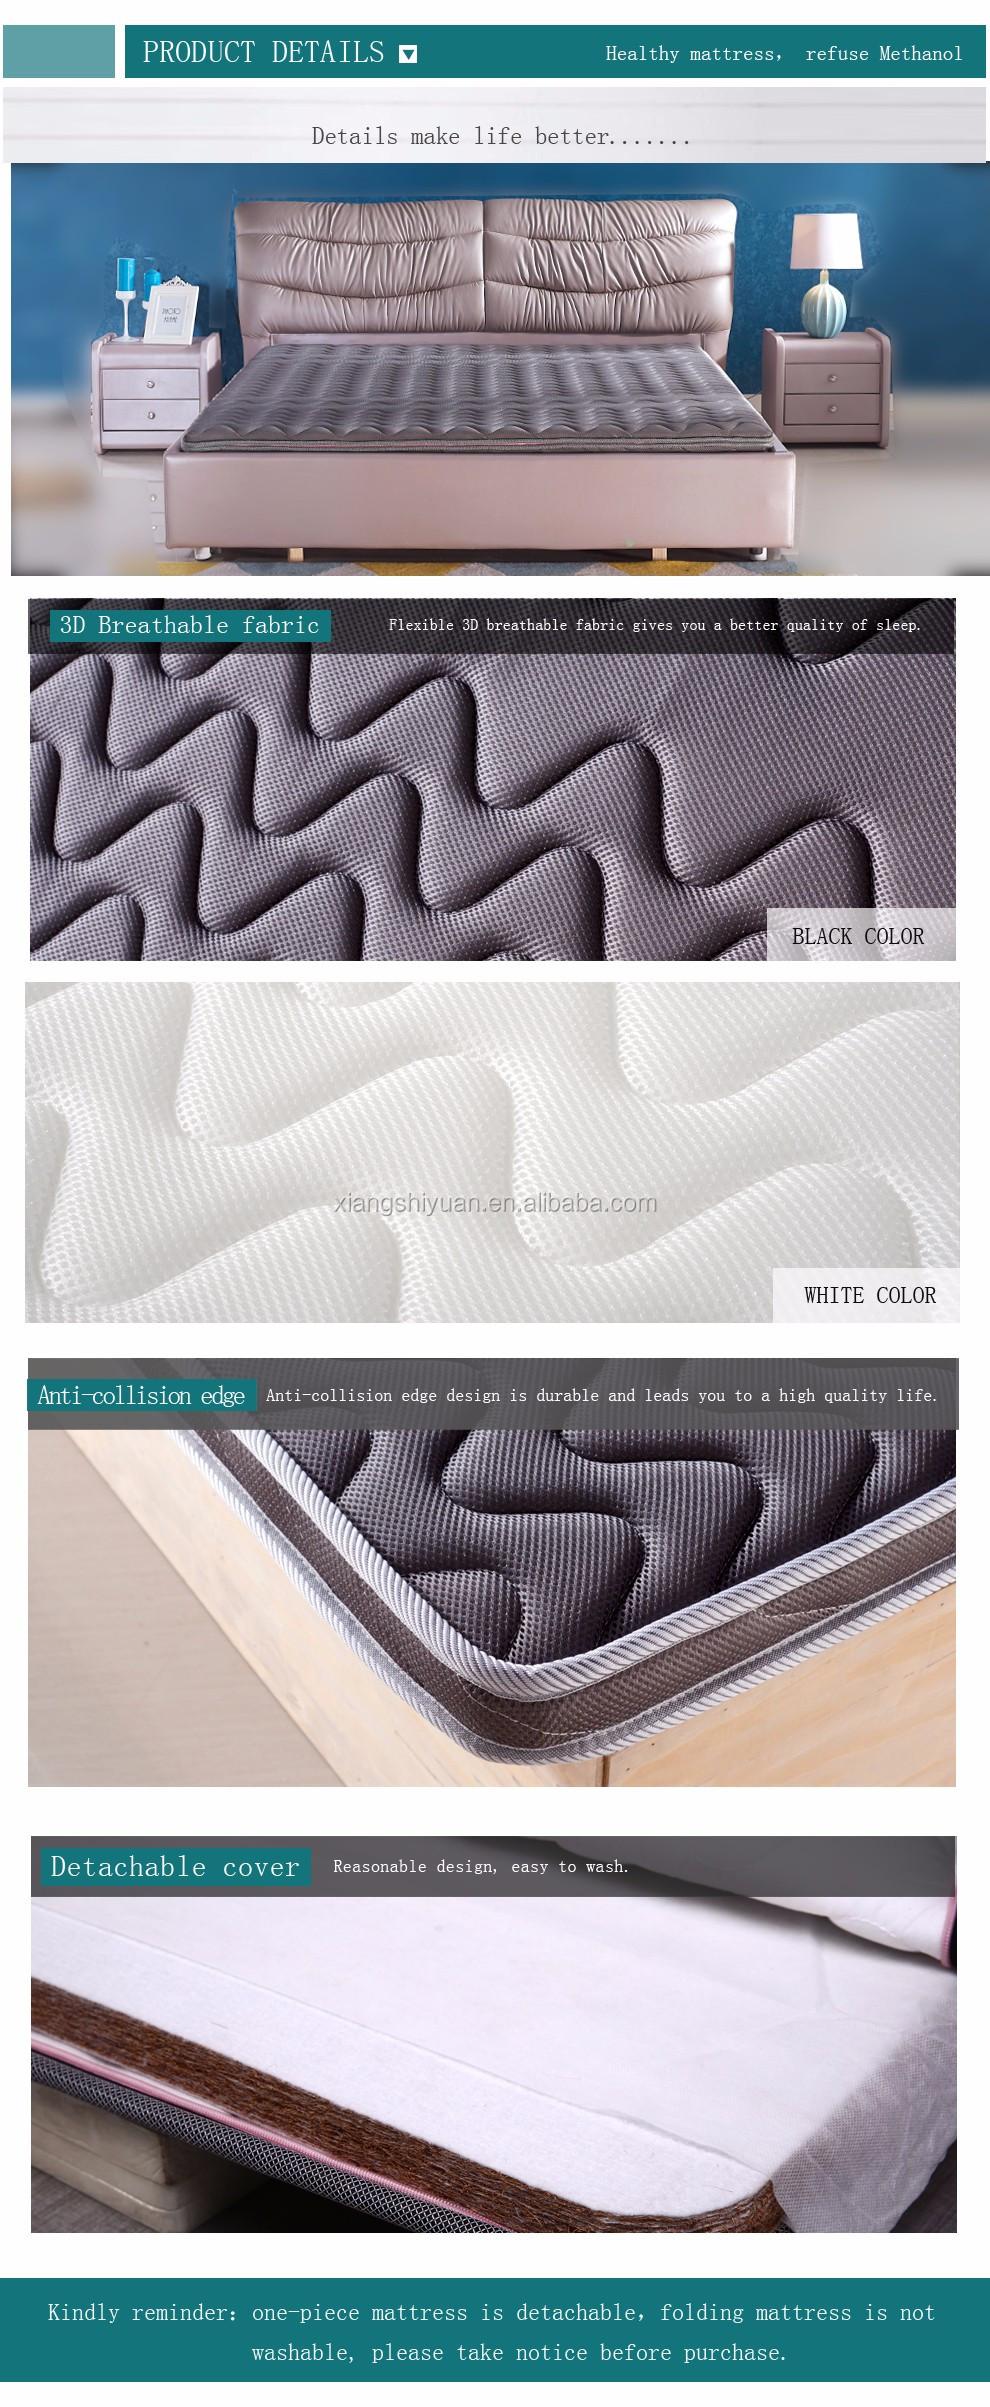 wholesale cheap price coconut fiber latex mattress with sponge mattress topper - Jozy Mattress   Jozy.net